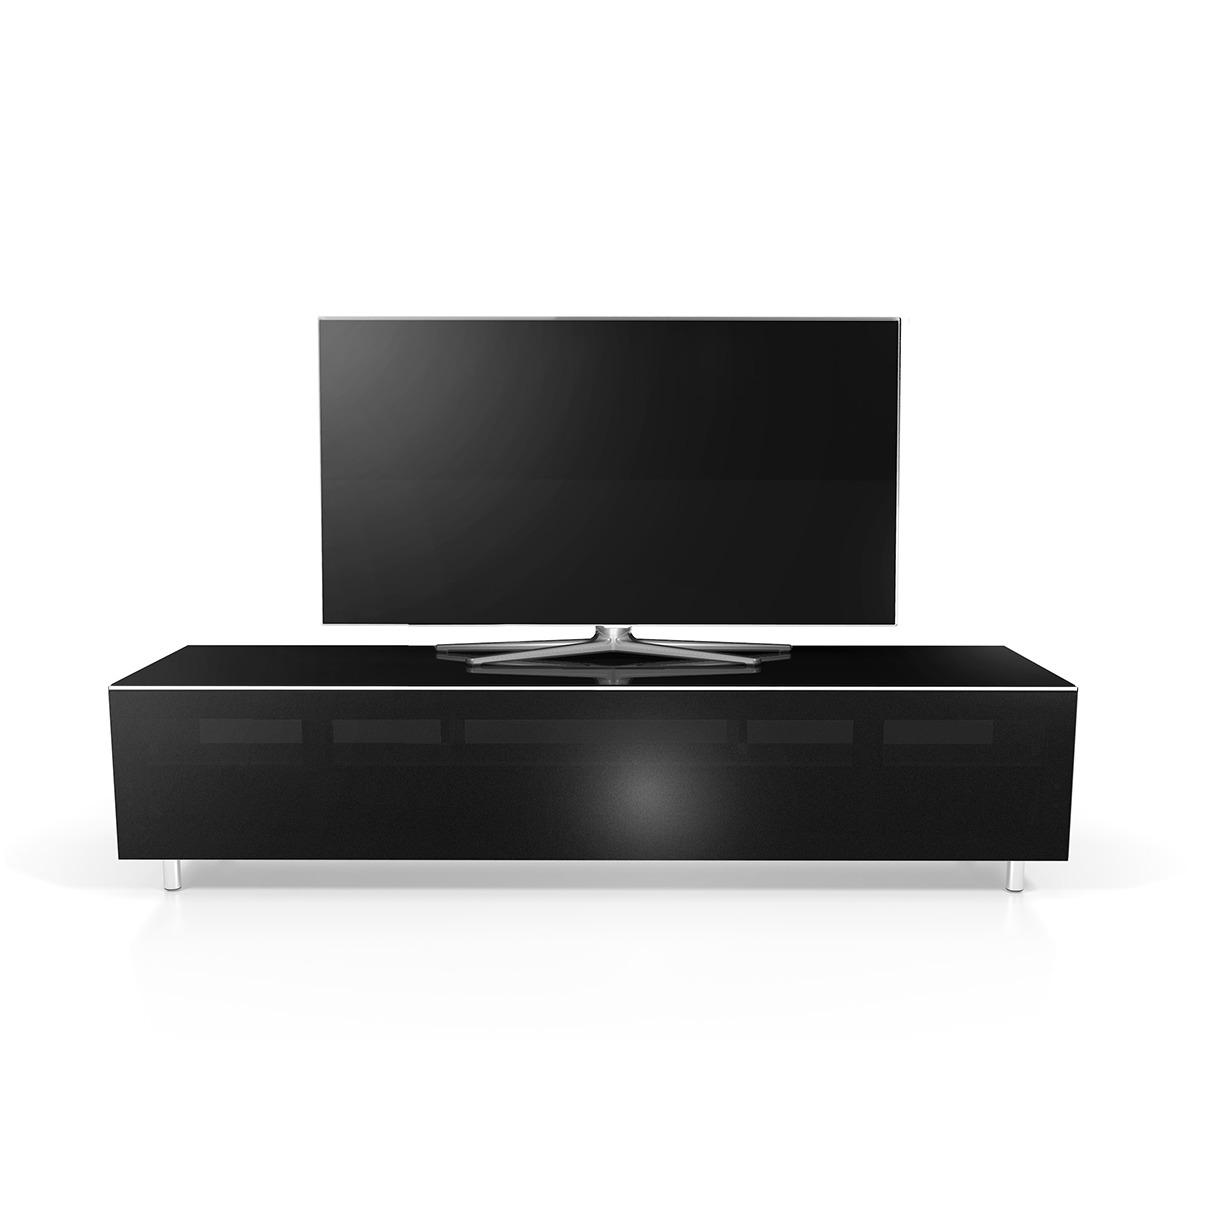 Afbeelding van Just Racks tv meubel JRL1651S-BG